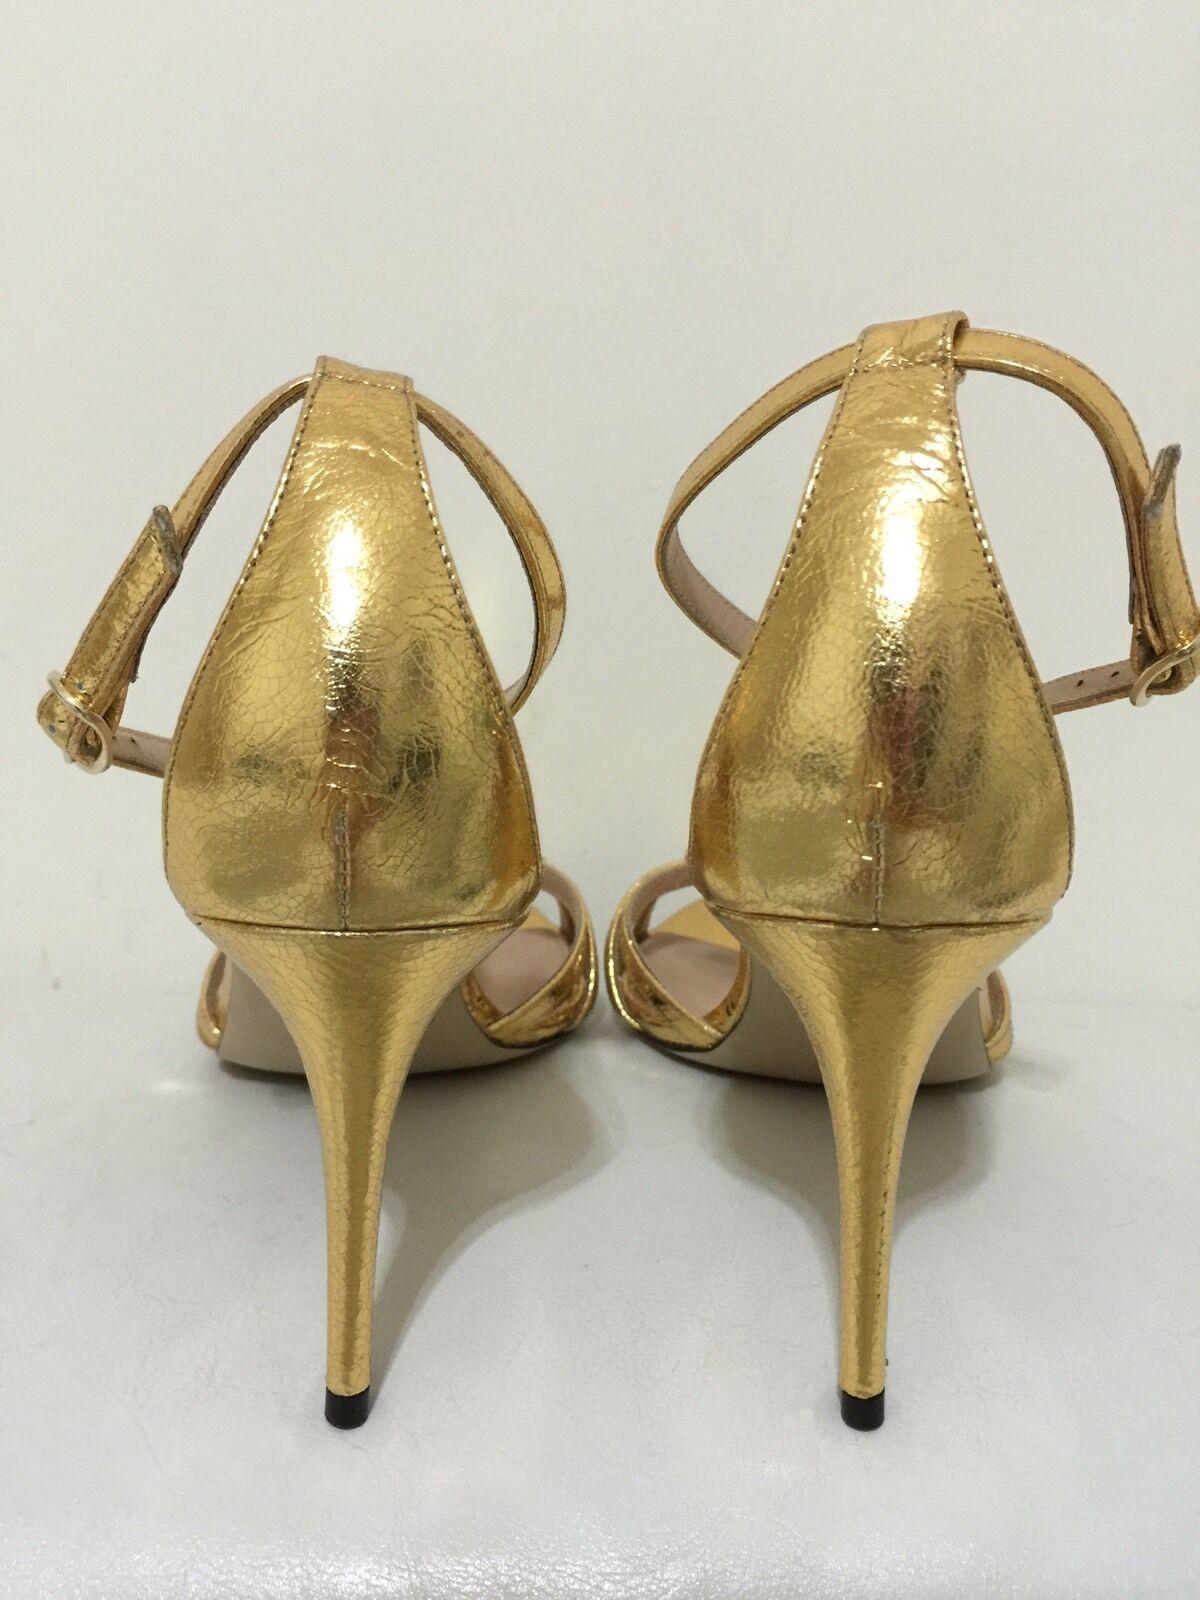 New  268 J.Crew gold Crackled Metallic Party Heels Sandals Sandals Sandals 10.5 E7321 NEW 8a2329